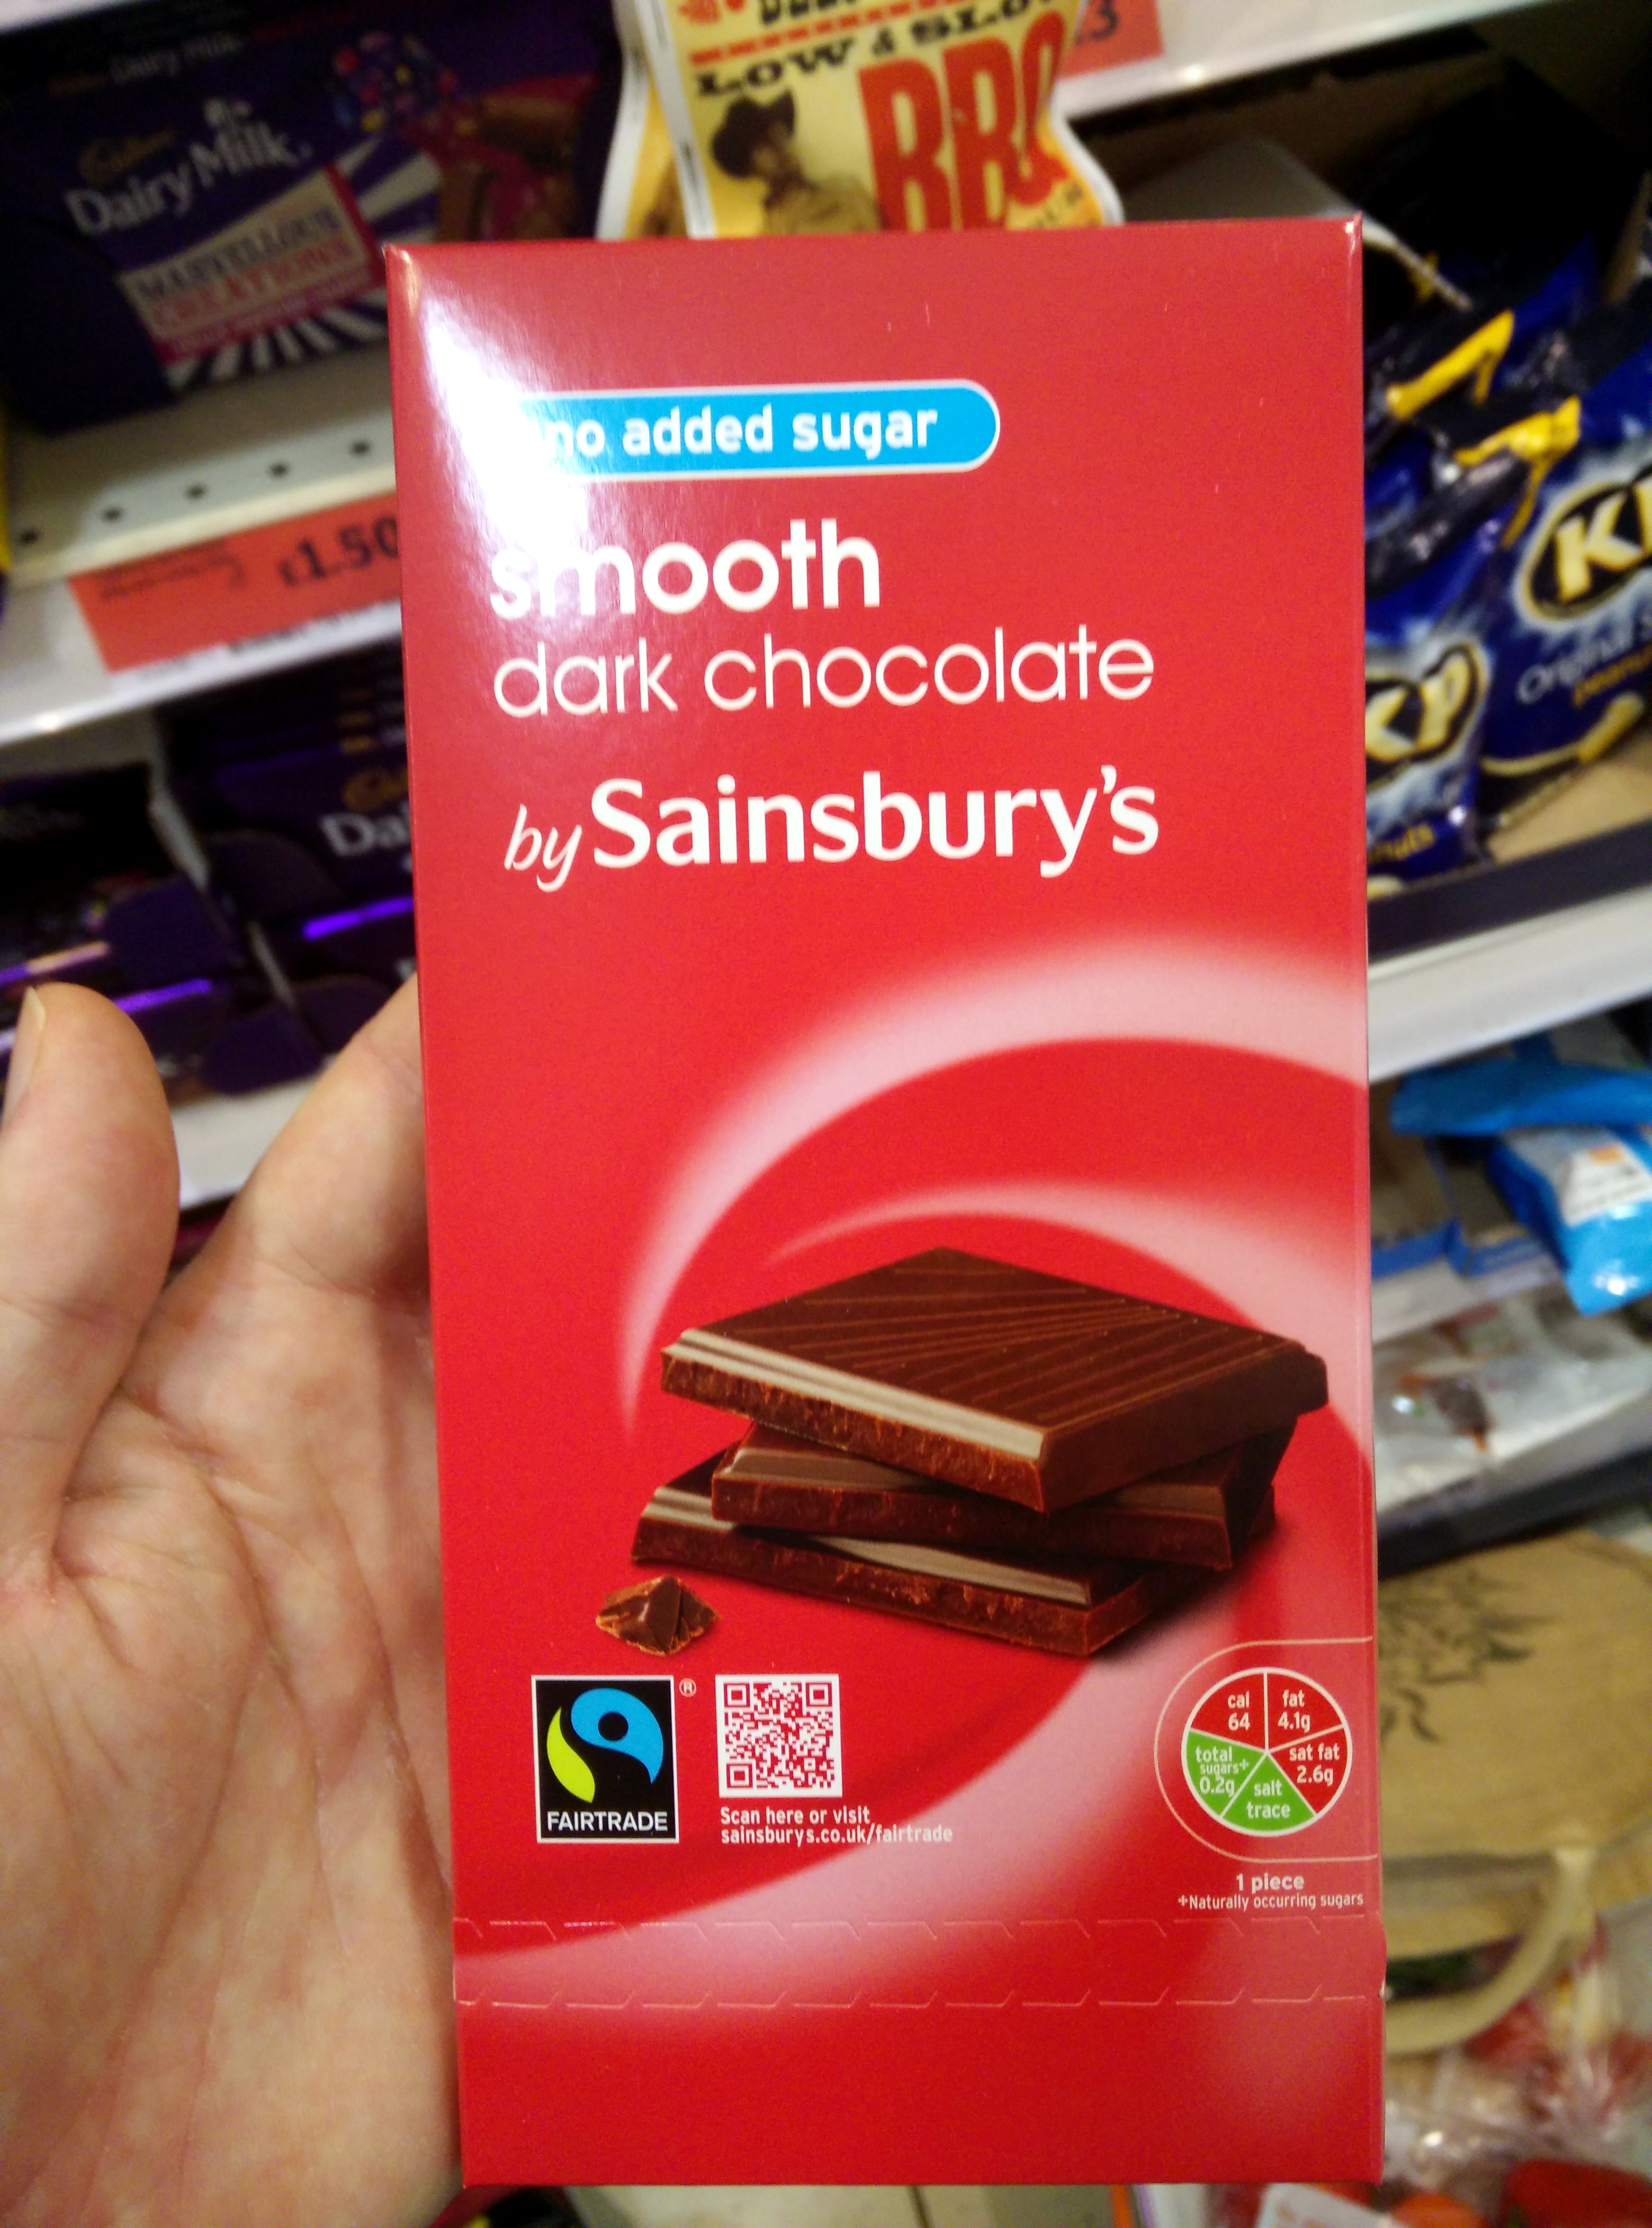 No Added Sugar Smooth Dark Chocolate - Product